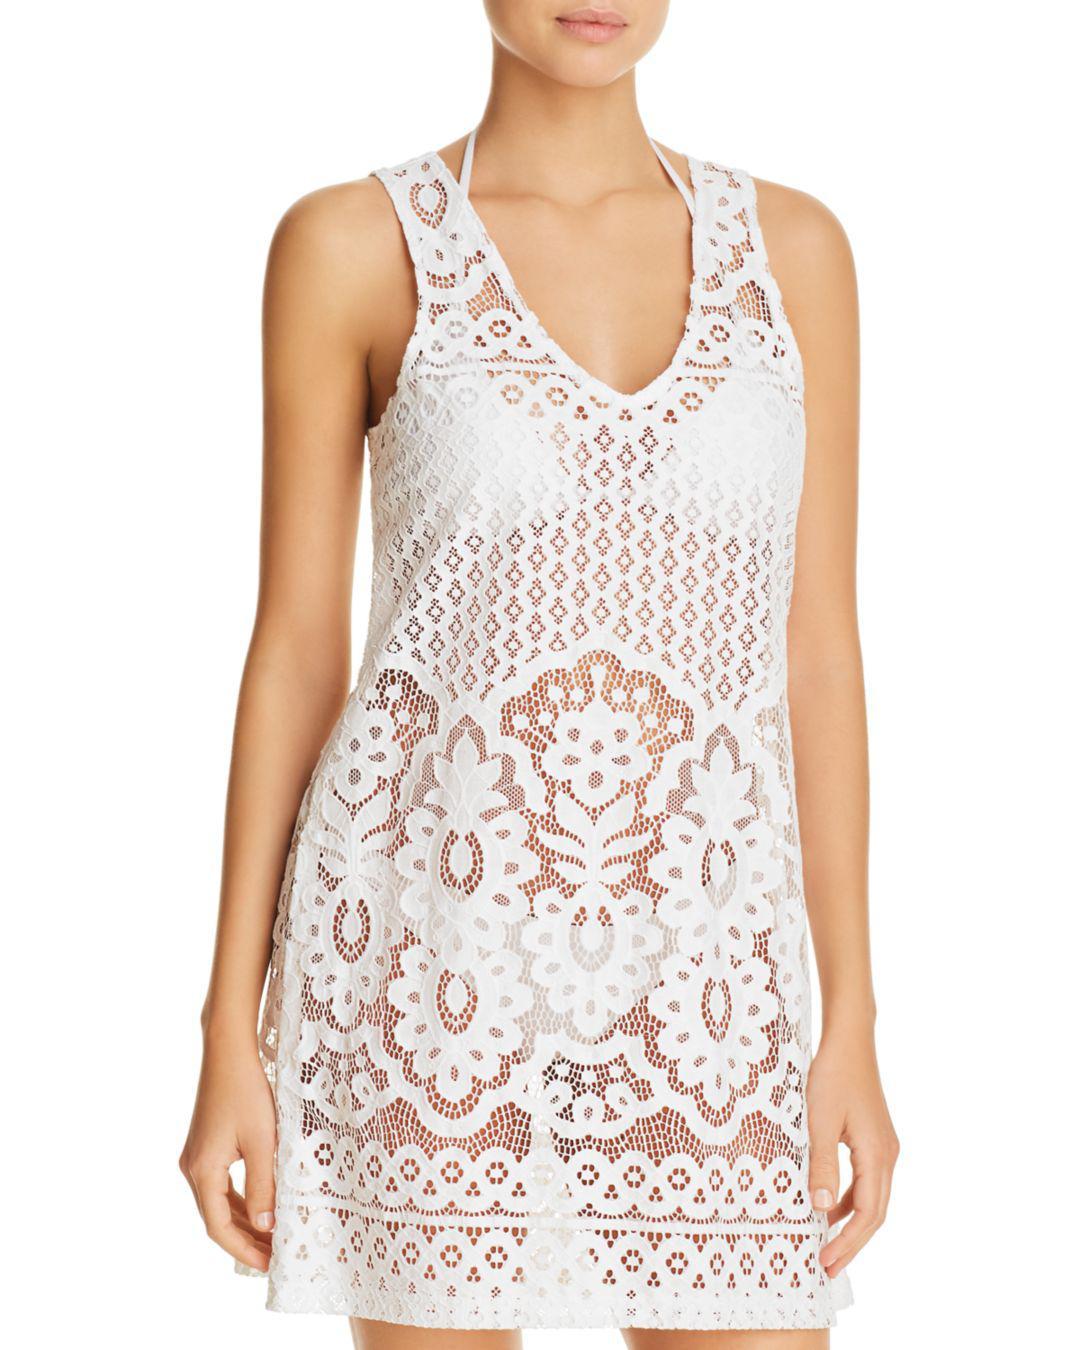 682d69b50f J Valdi Pina Colada Lace Dress Swim Cover-up in White - Lyst